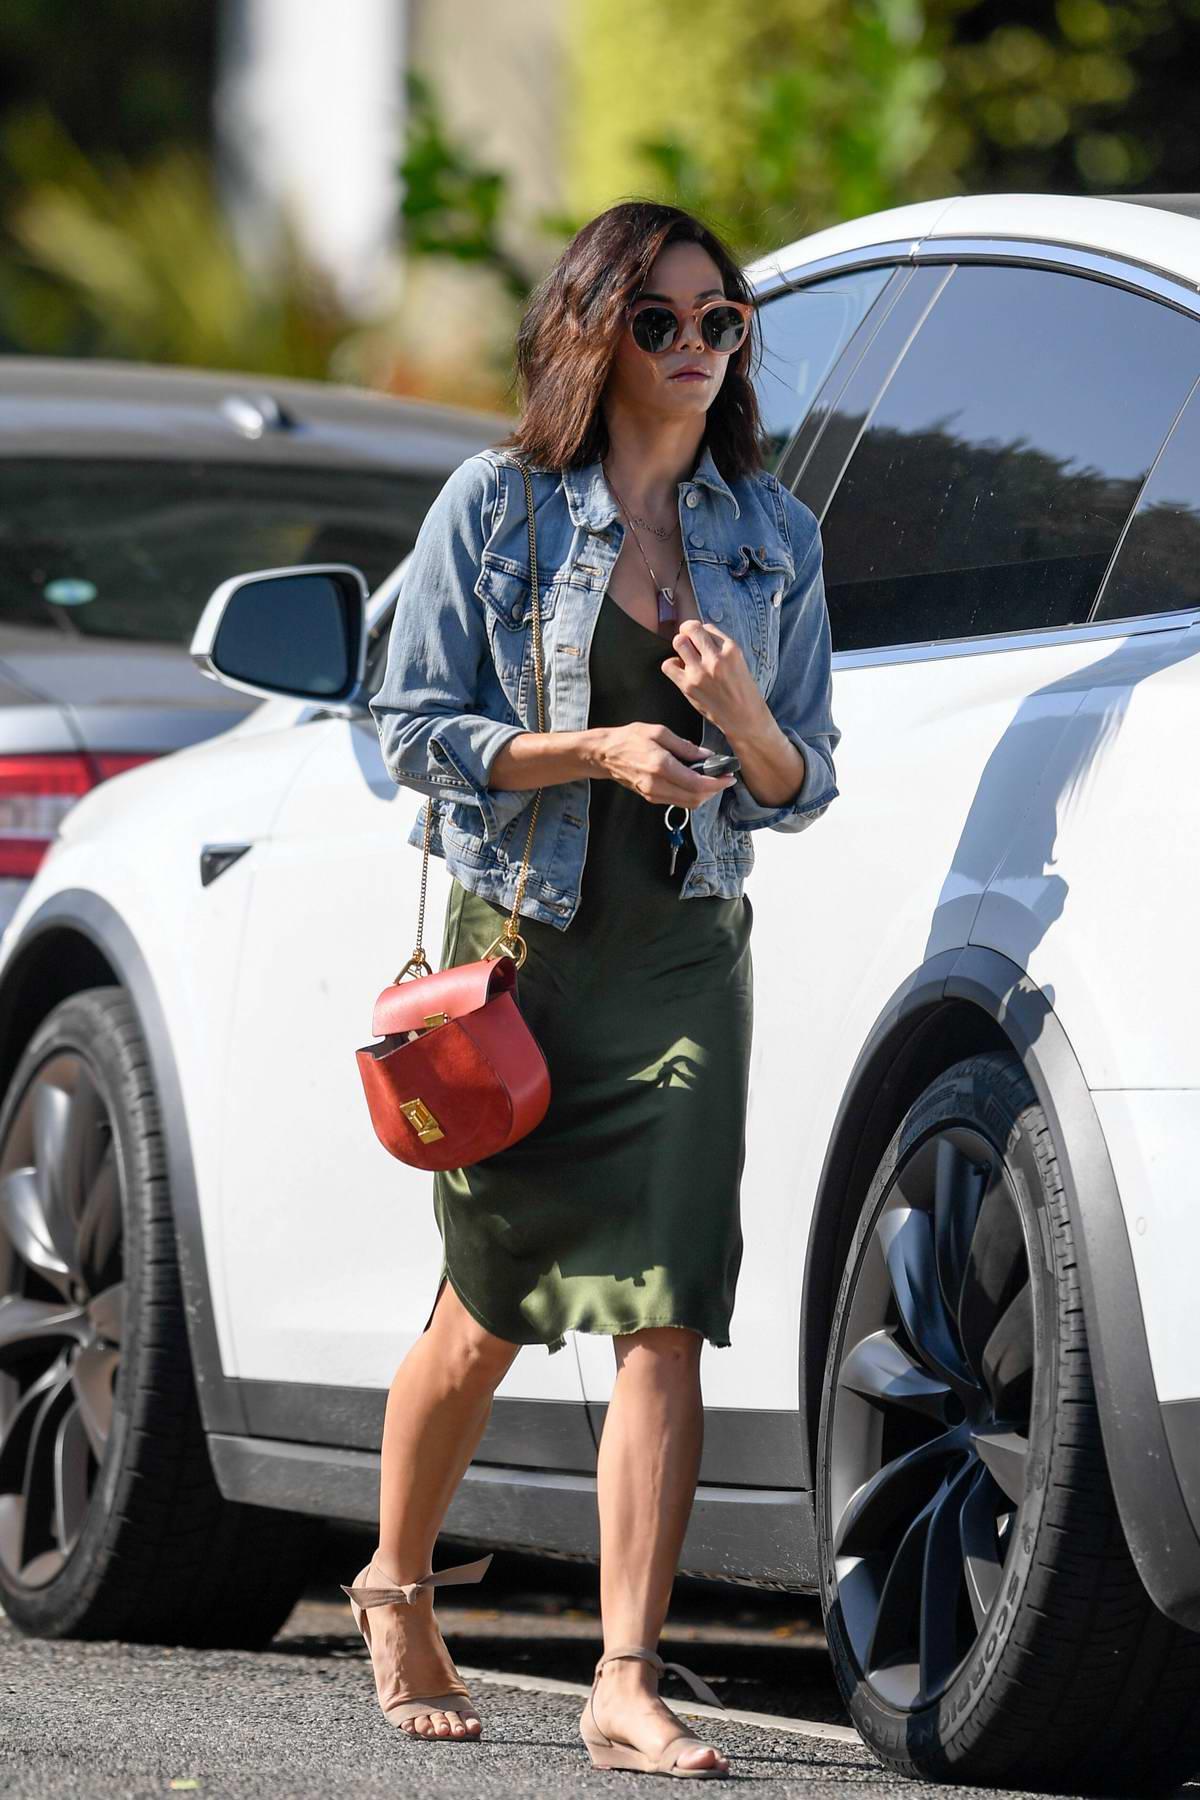 Jenna Dewan wears a green silk dress with denim jacket while visiting a friend in Santa Monica, California